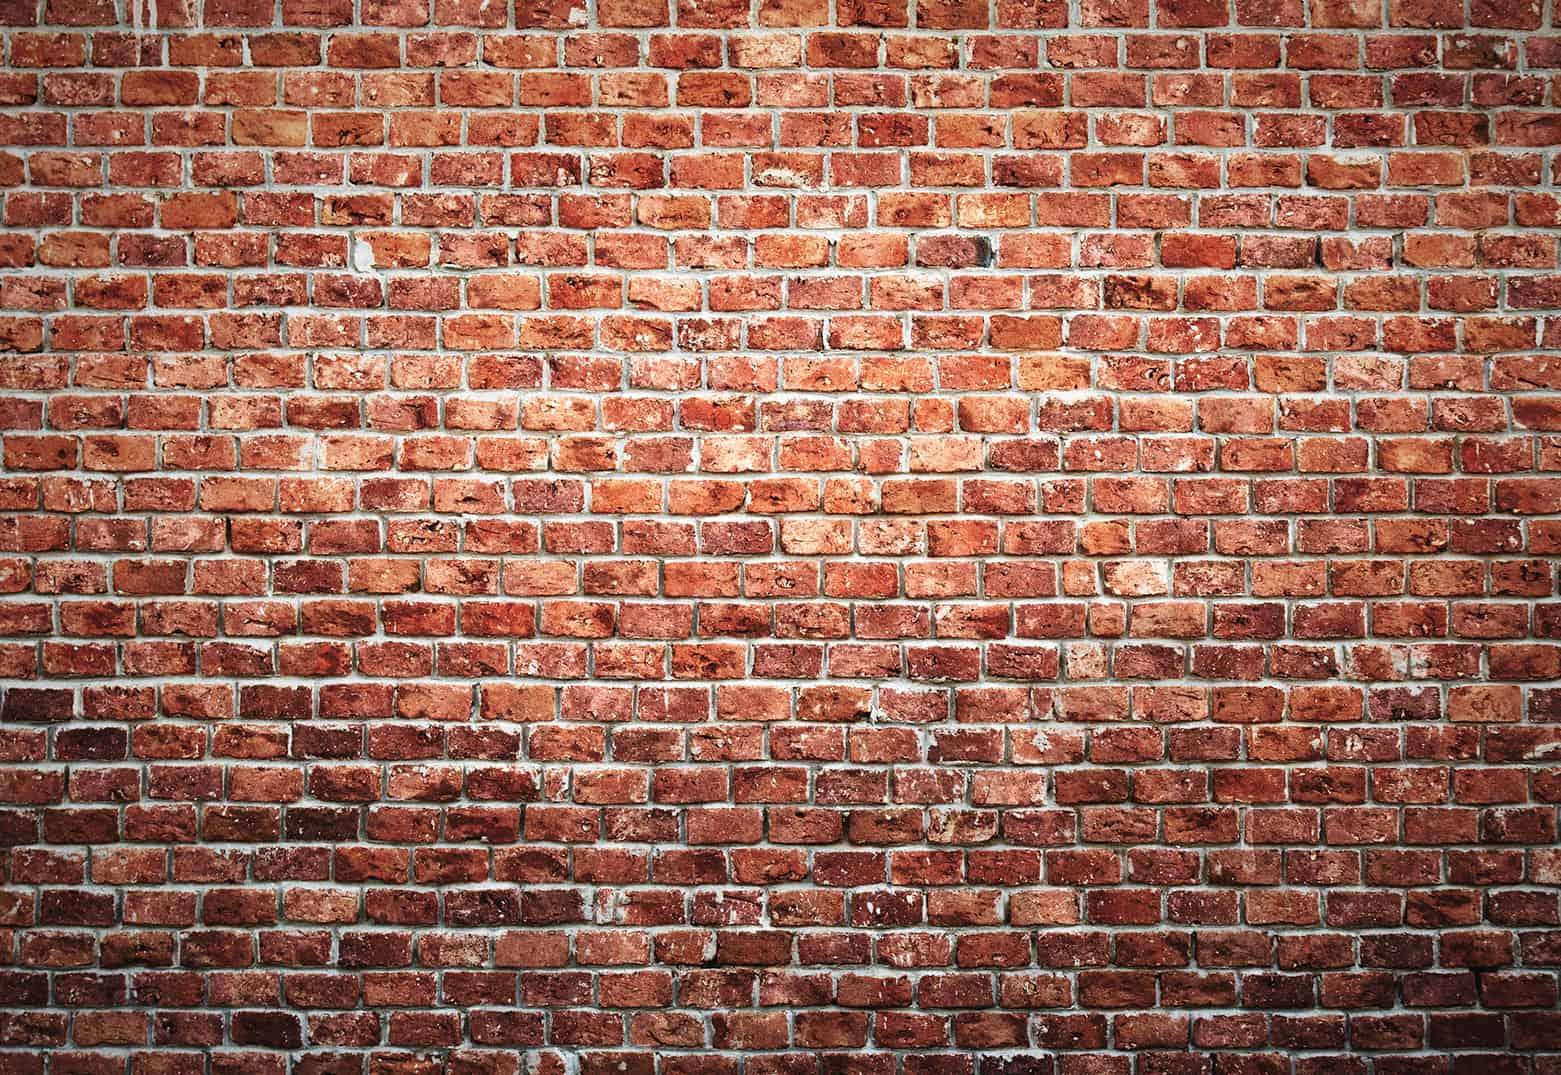 brick wall symbolizing information blocking